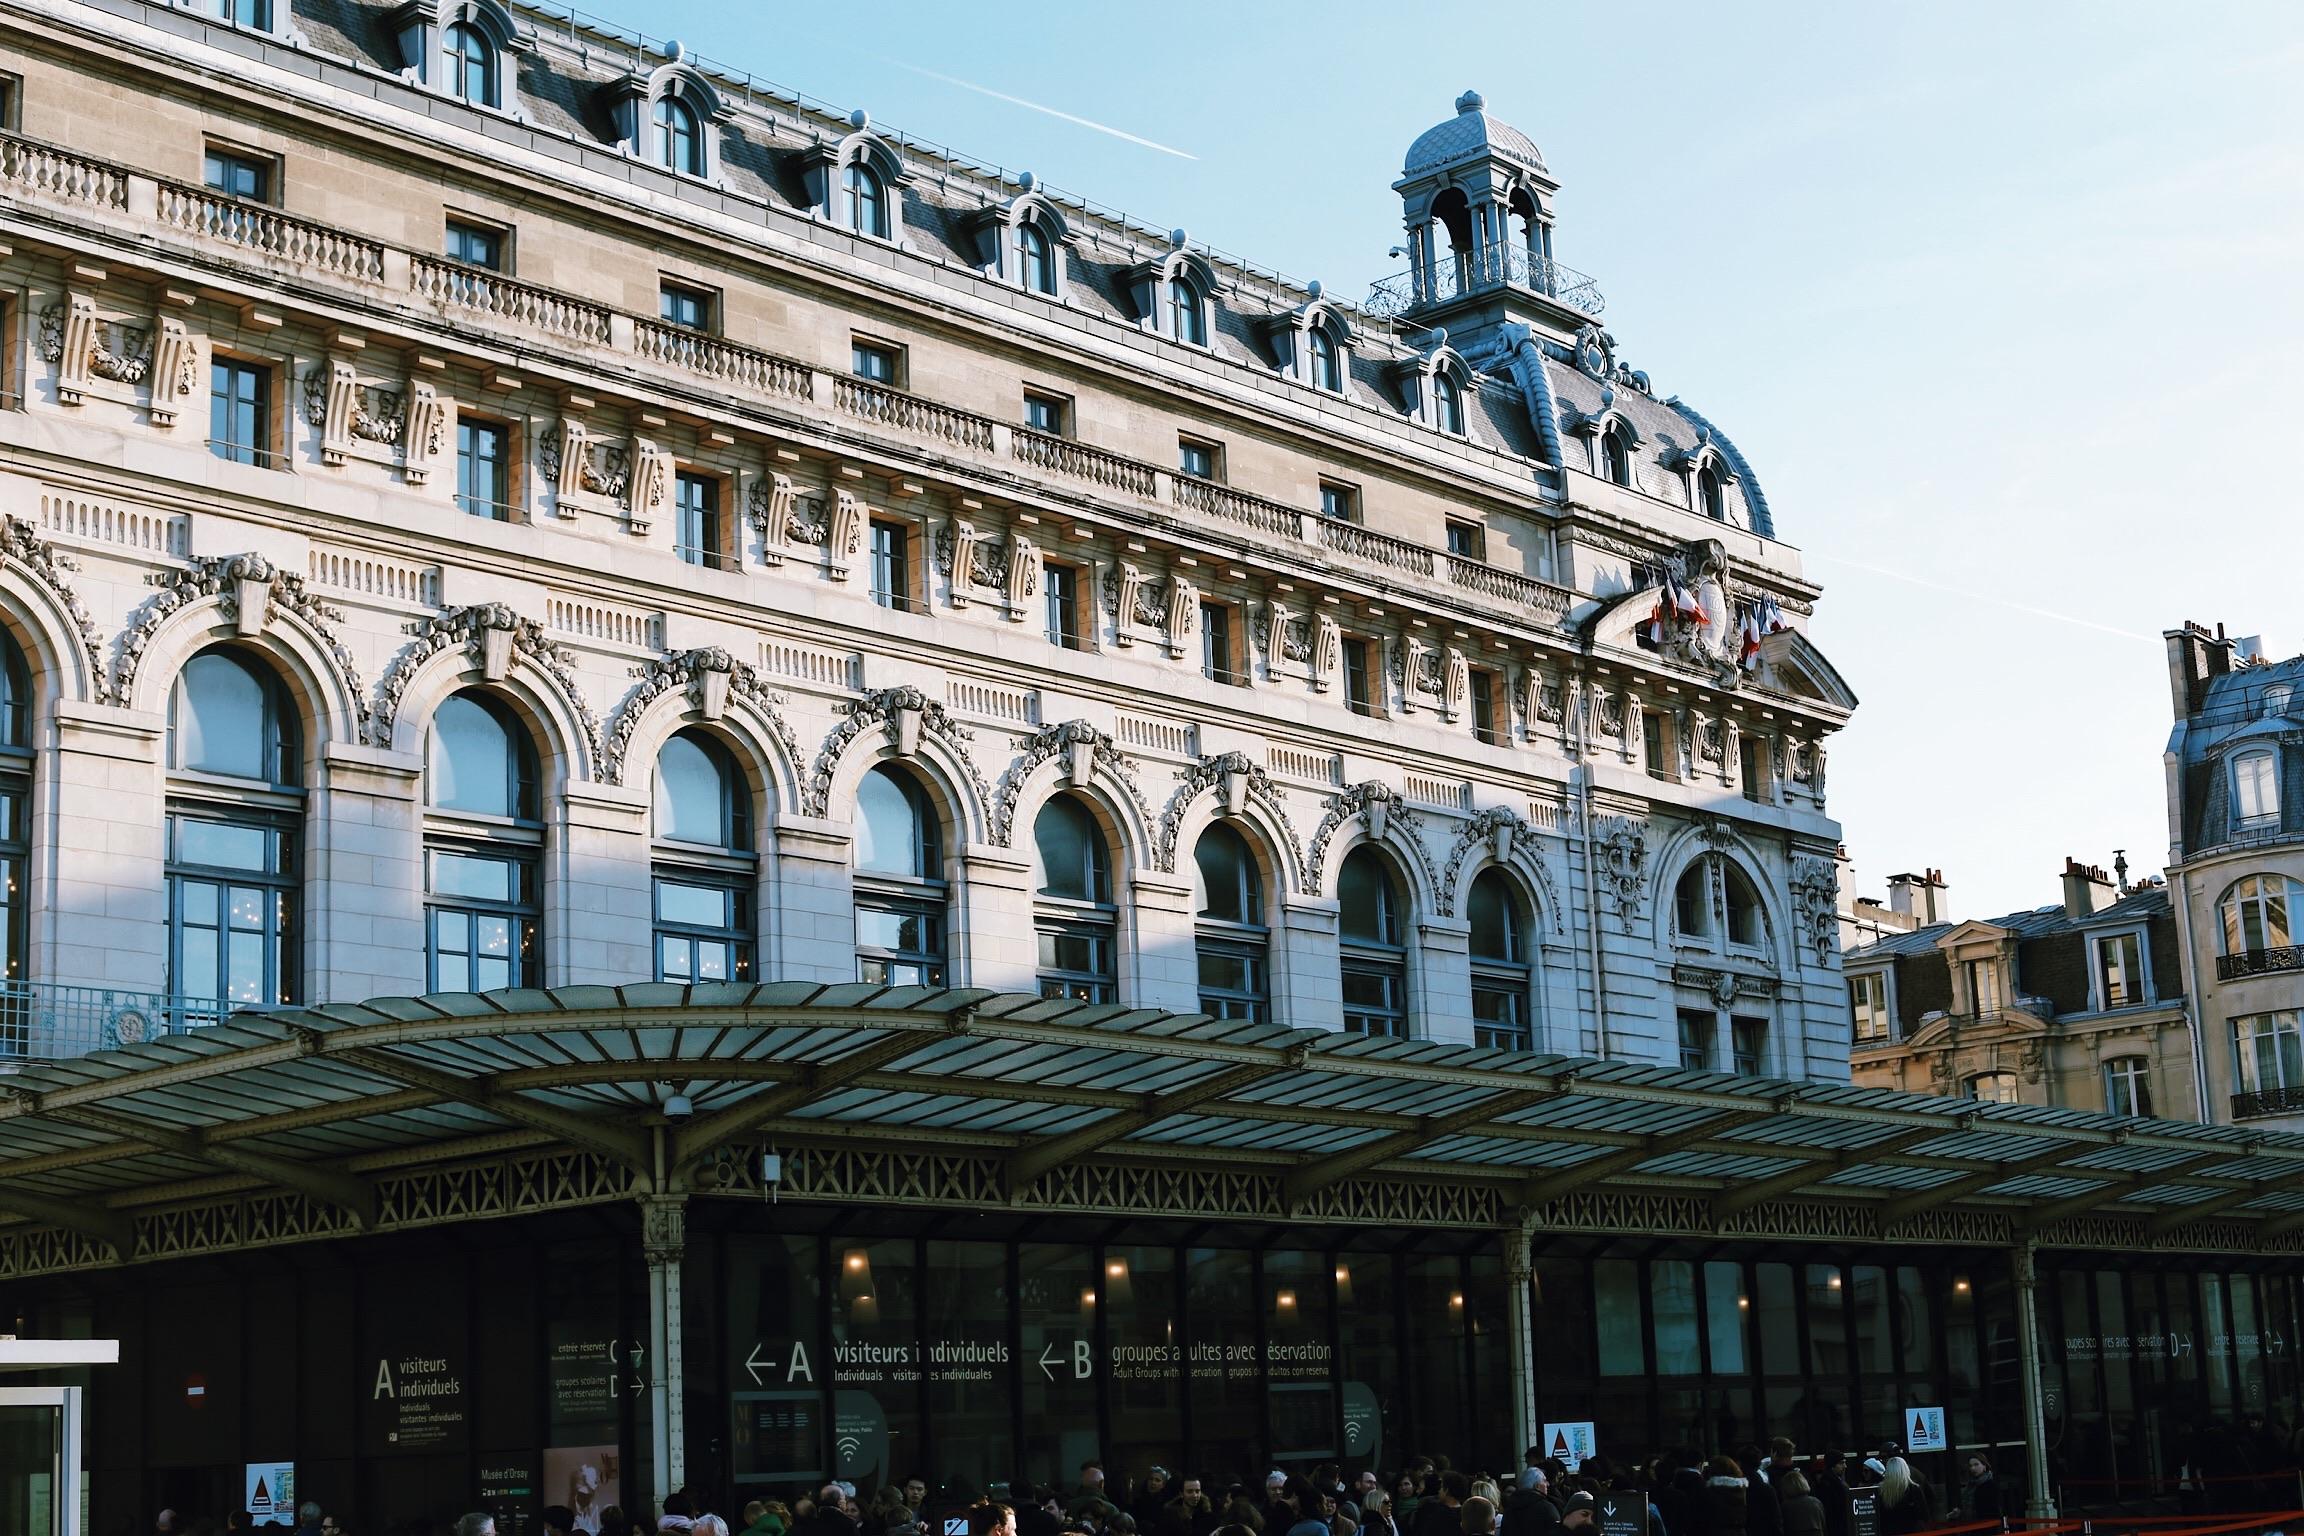 Musée-dOrsay-Paris-Guided-Orsay-Museum-Paris-Museum-Tour.